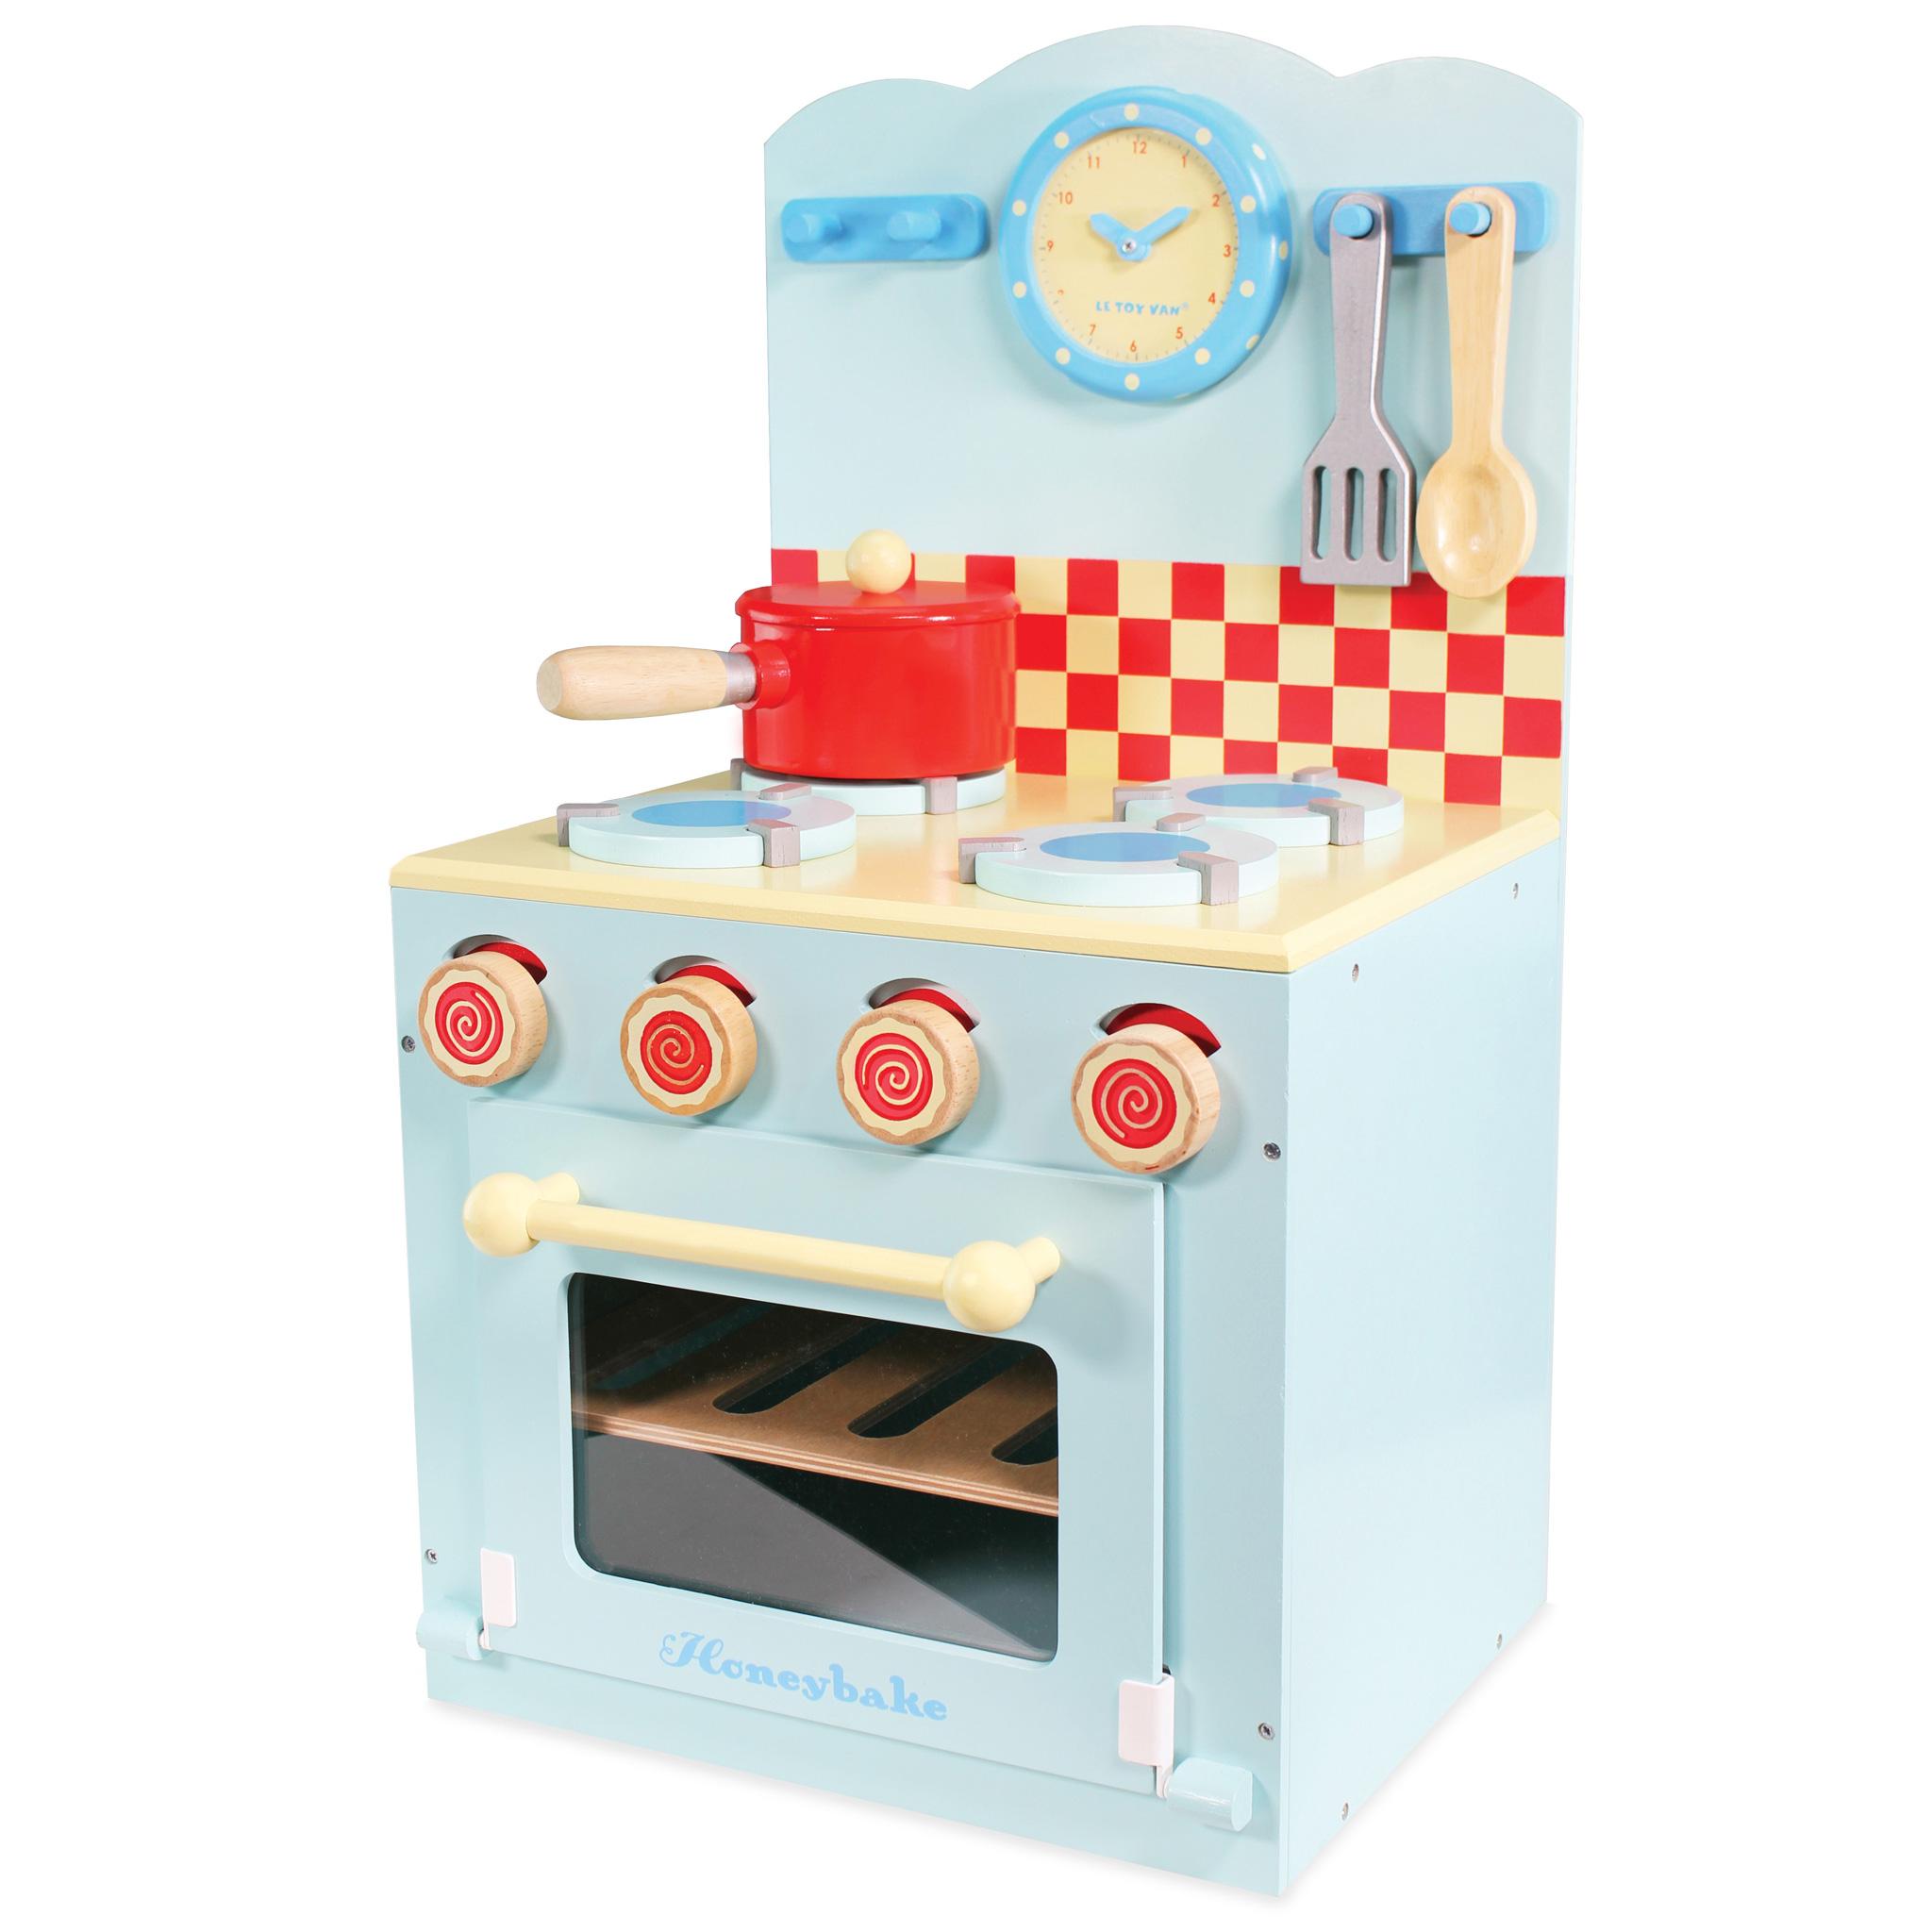 Oven & Hob Blue